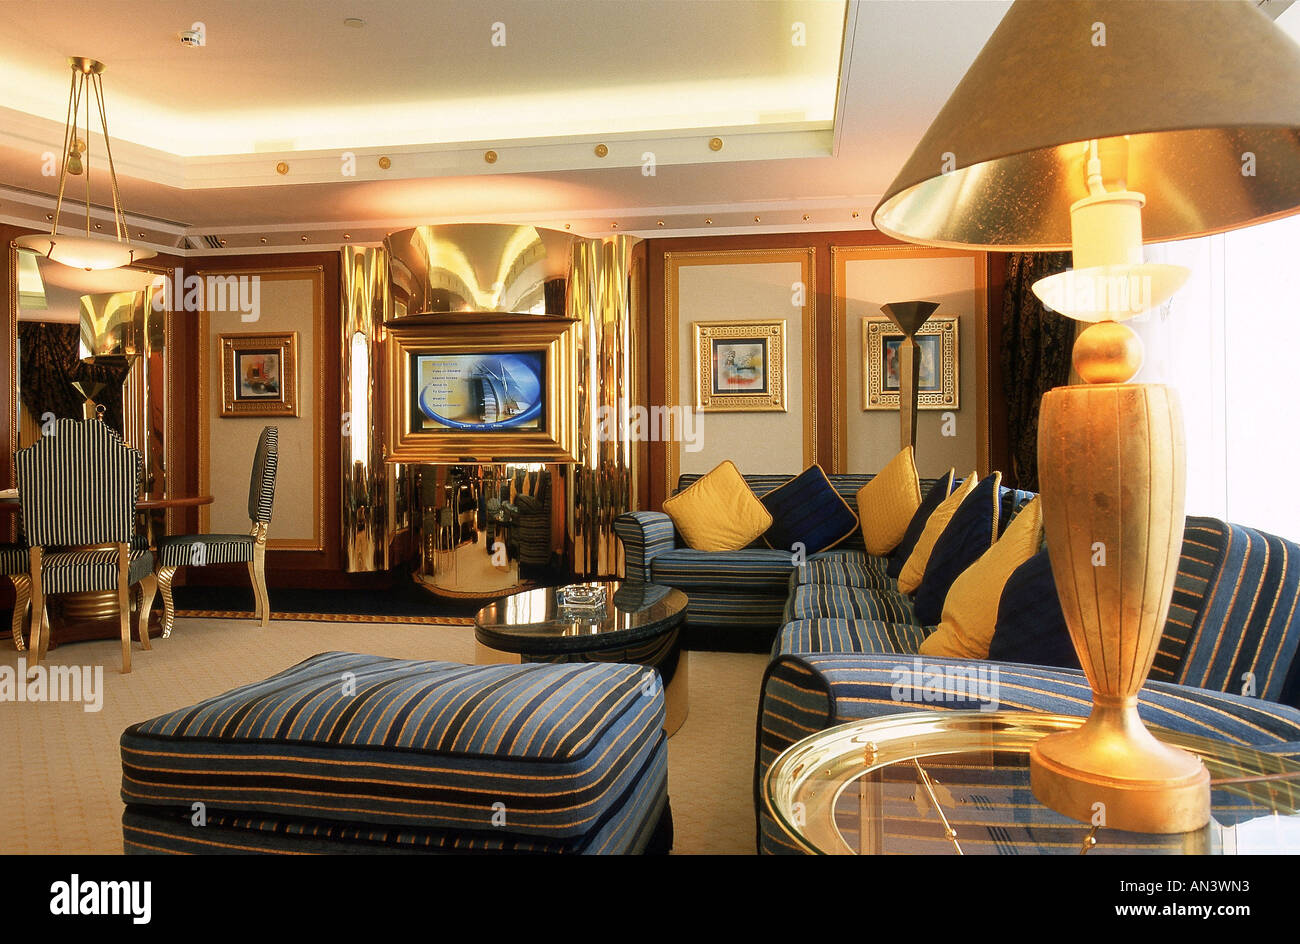 Are united arab emirates dubai 7 star for 7 star hotel dubai most expensive room